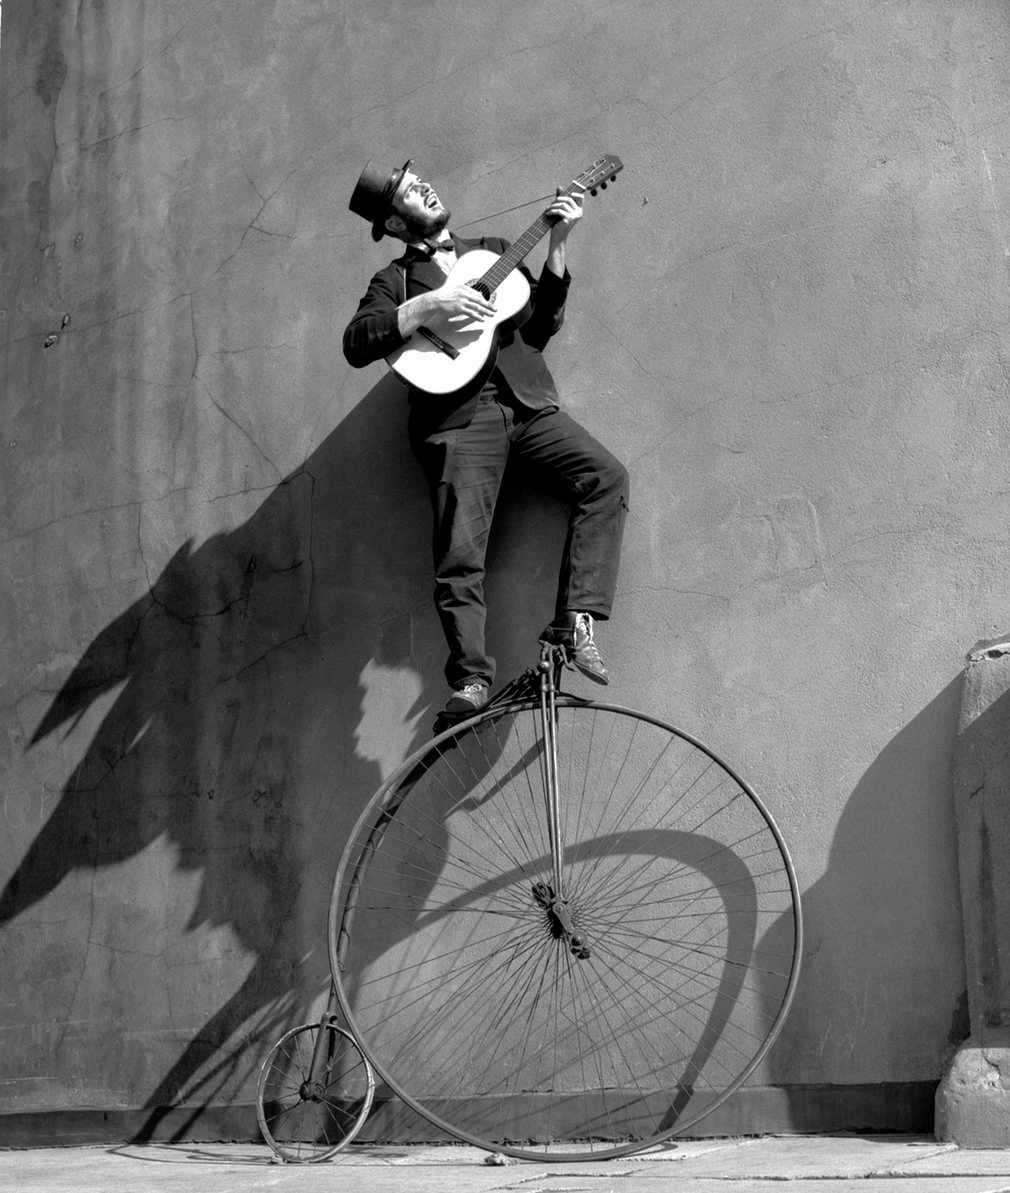 Fotó: Ken Russell: Troubadour: the Penny Farthing Bicycle, 1956 © Ken Russell/TopFoto